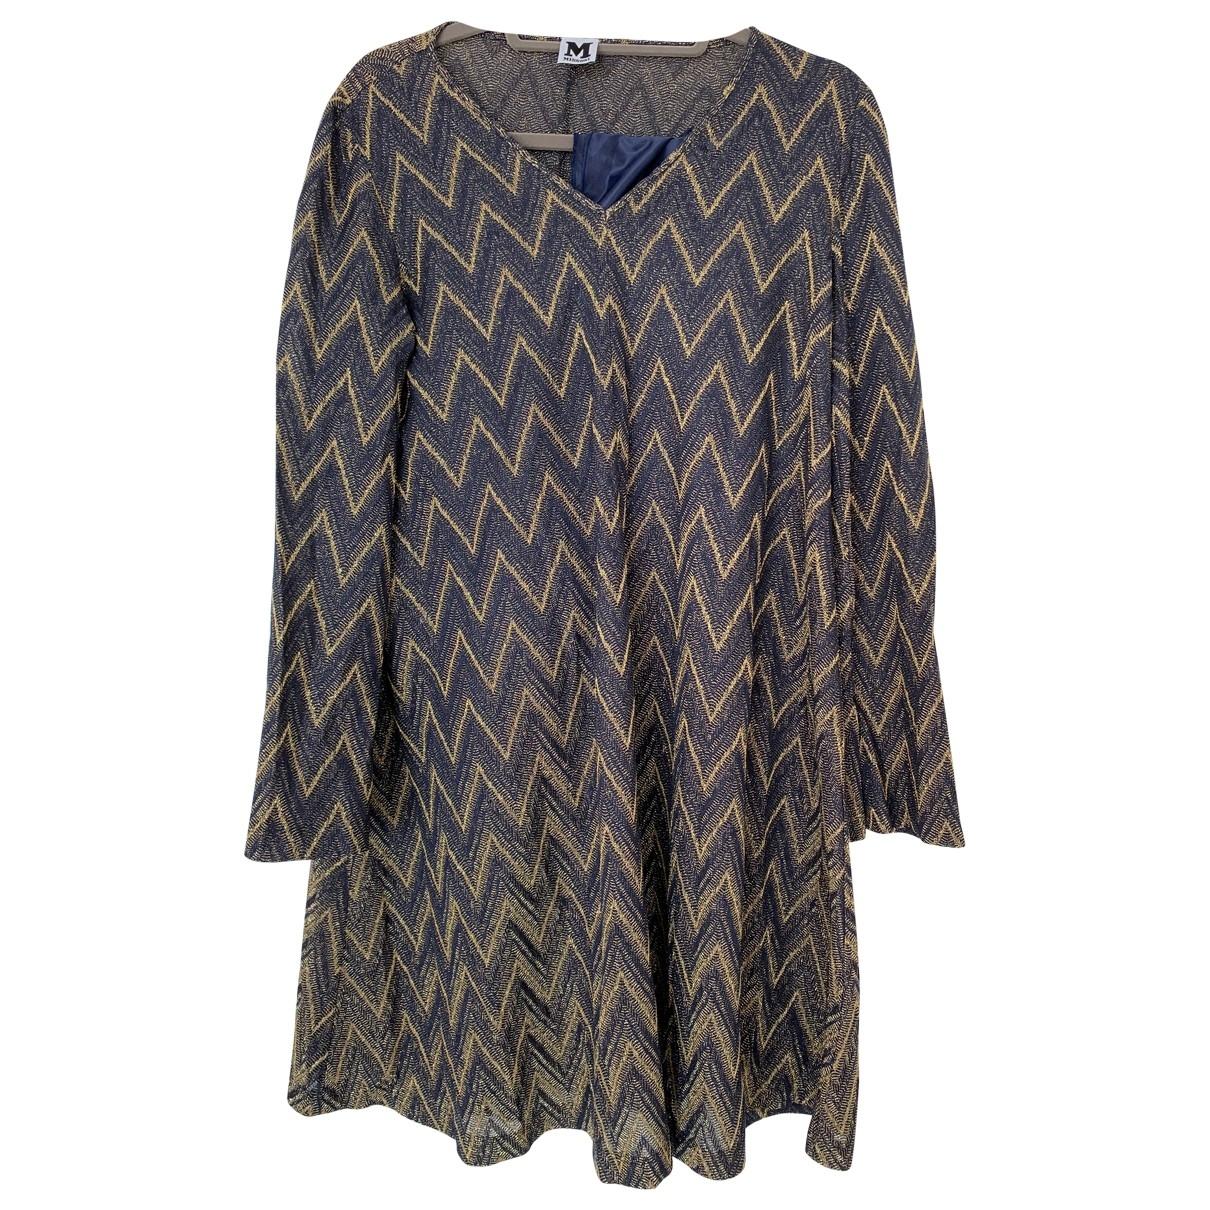 M Missoni \N Gold dress for Women M International